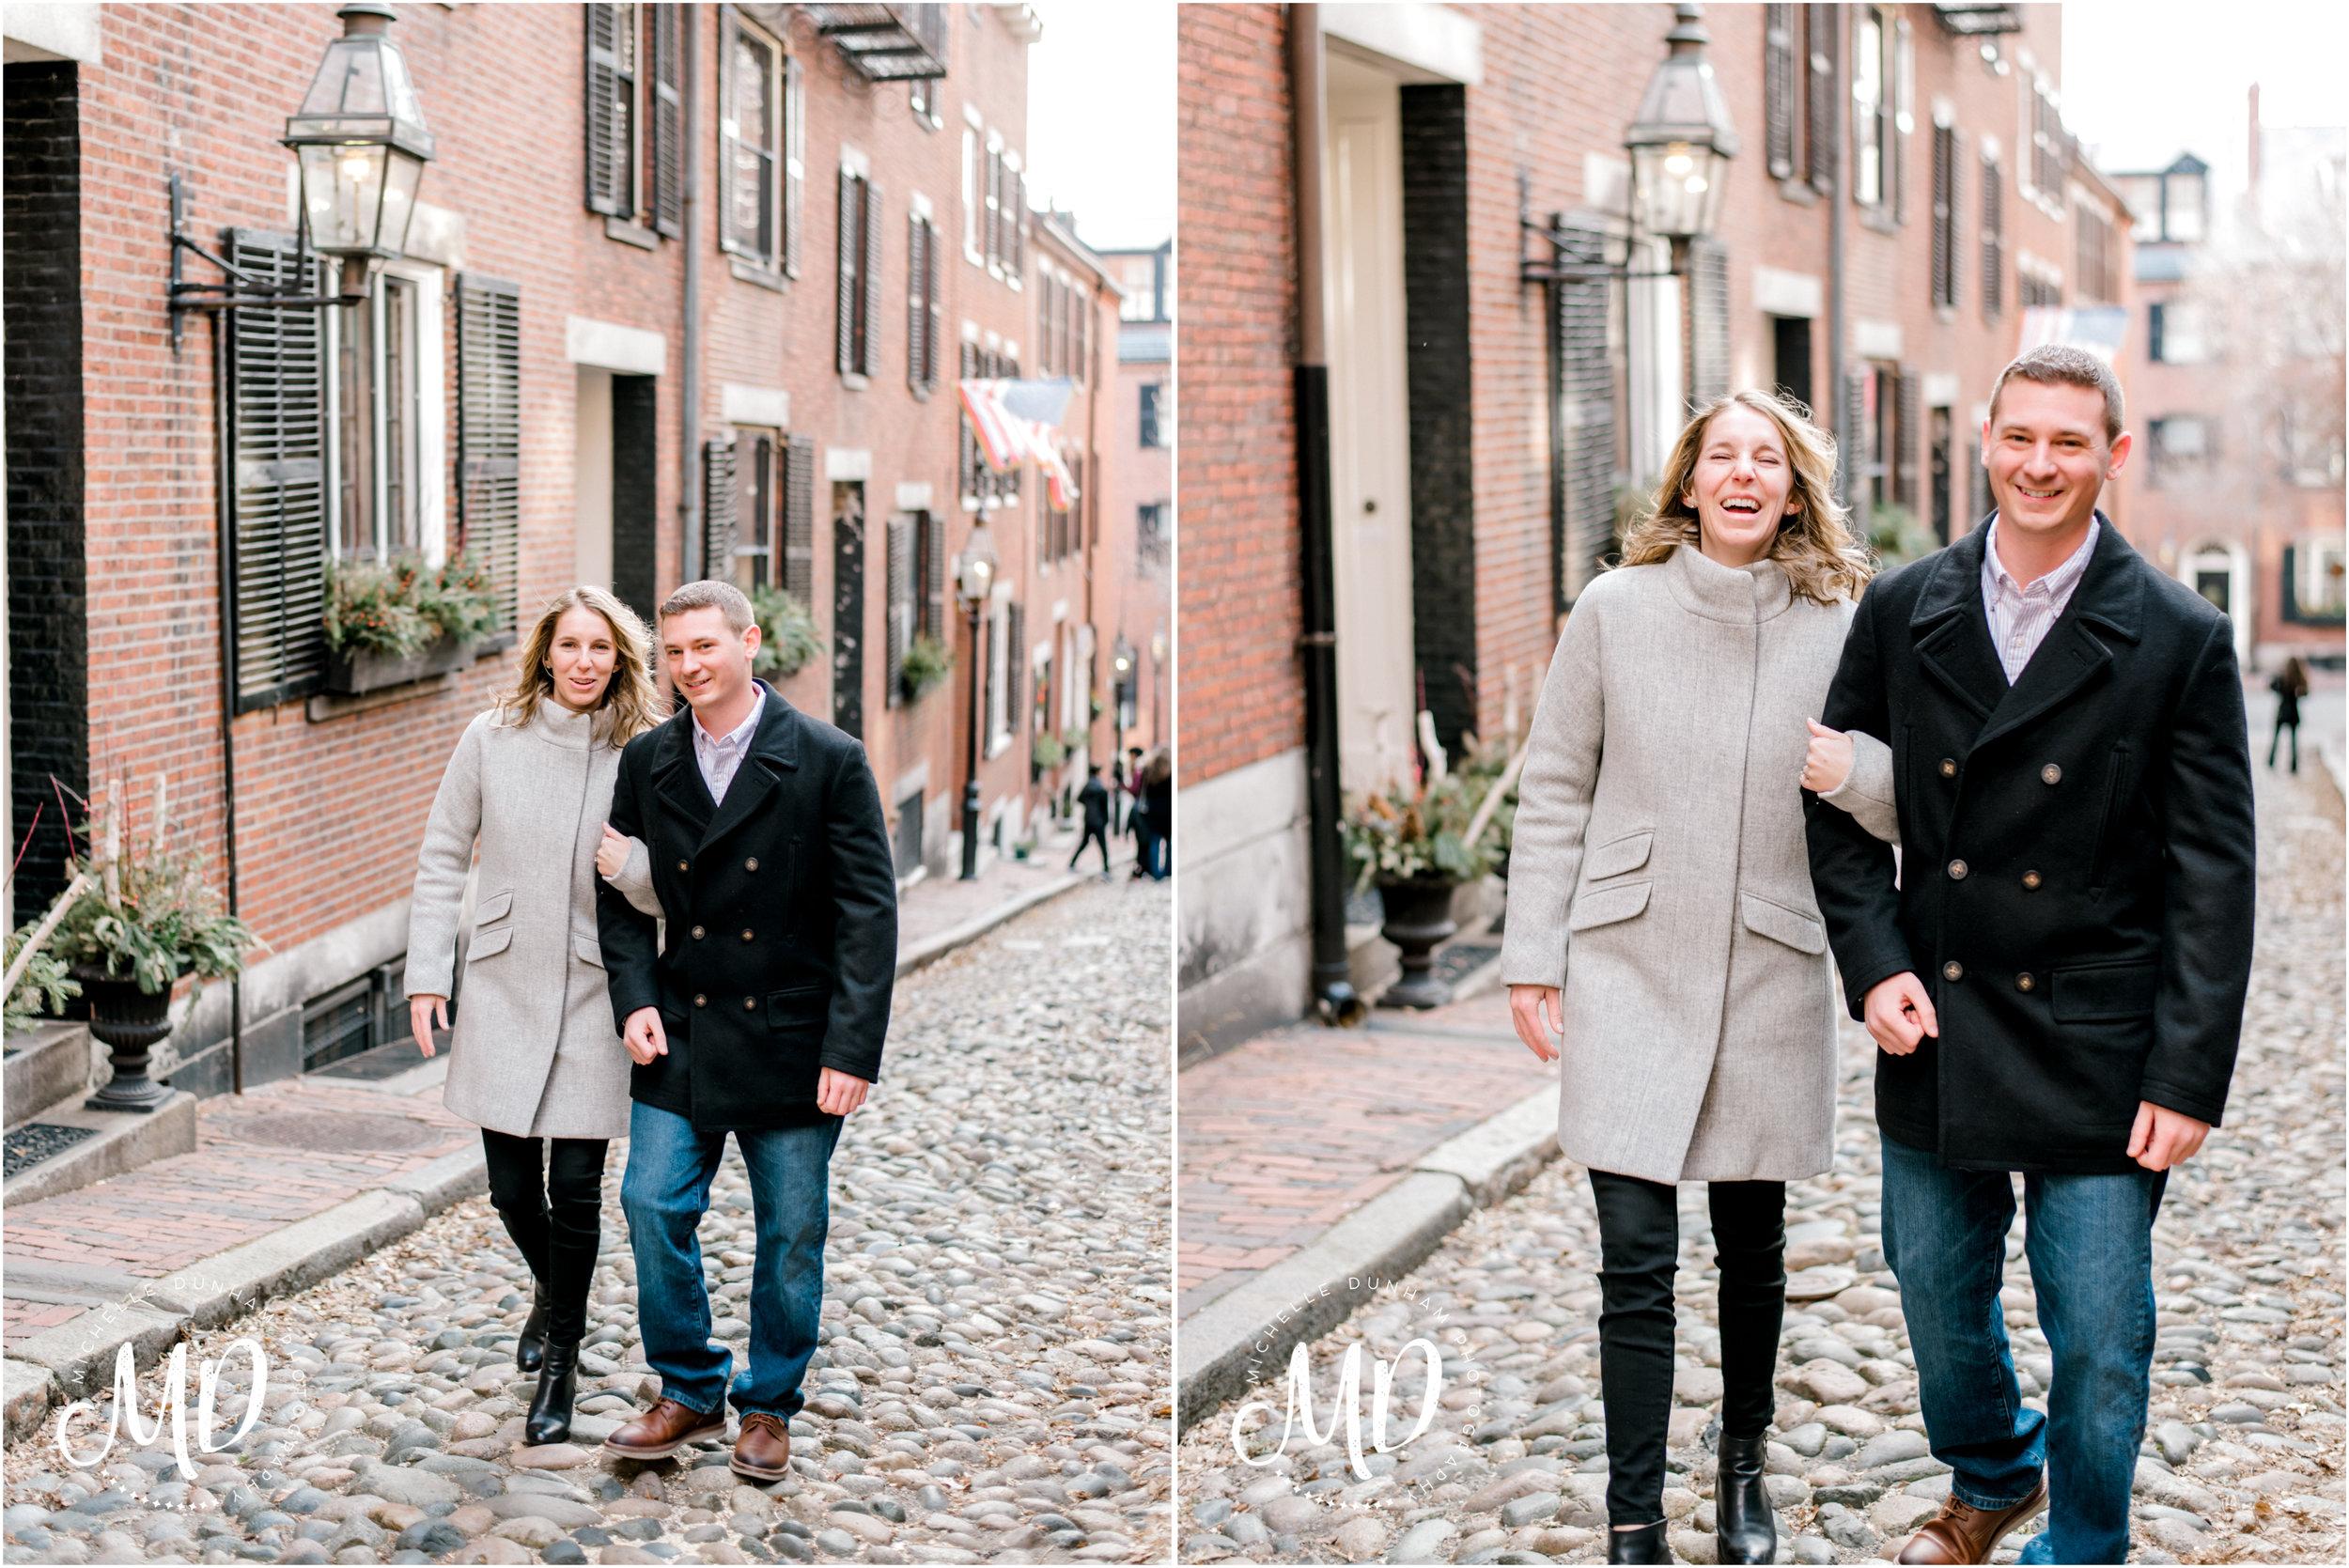 Michelle-Dunham-Photography-Beacon-Hill-Engagement-2.jpg